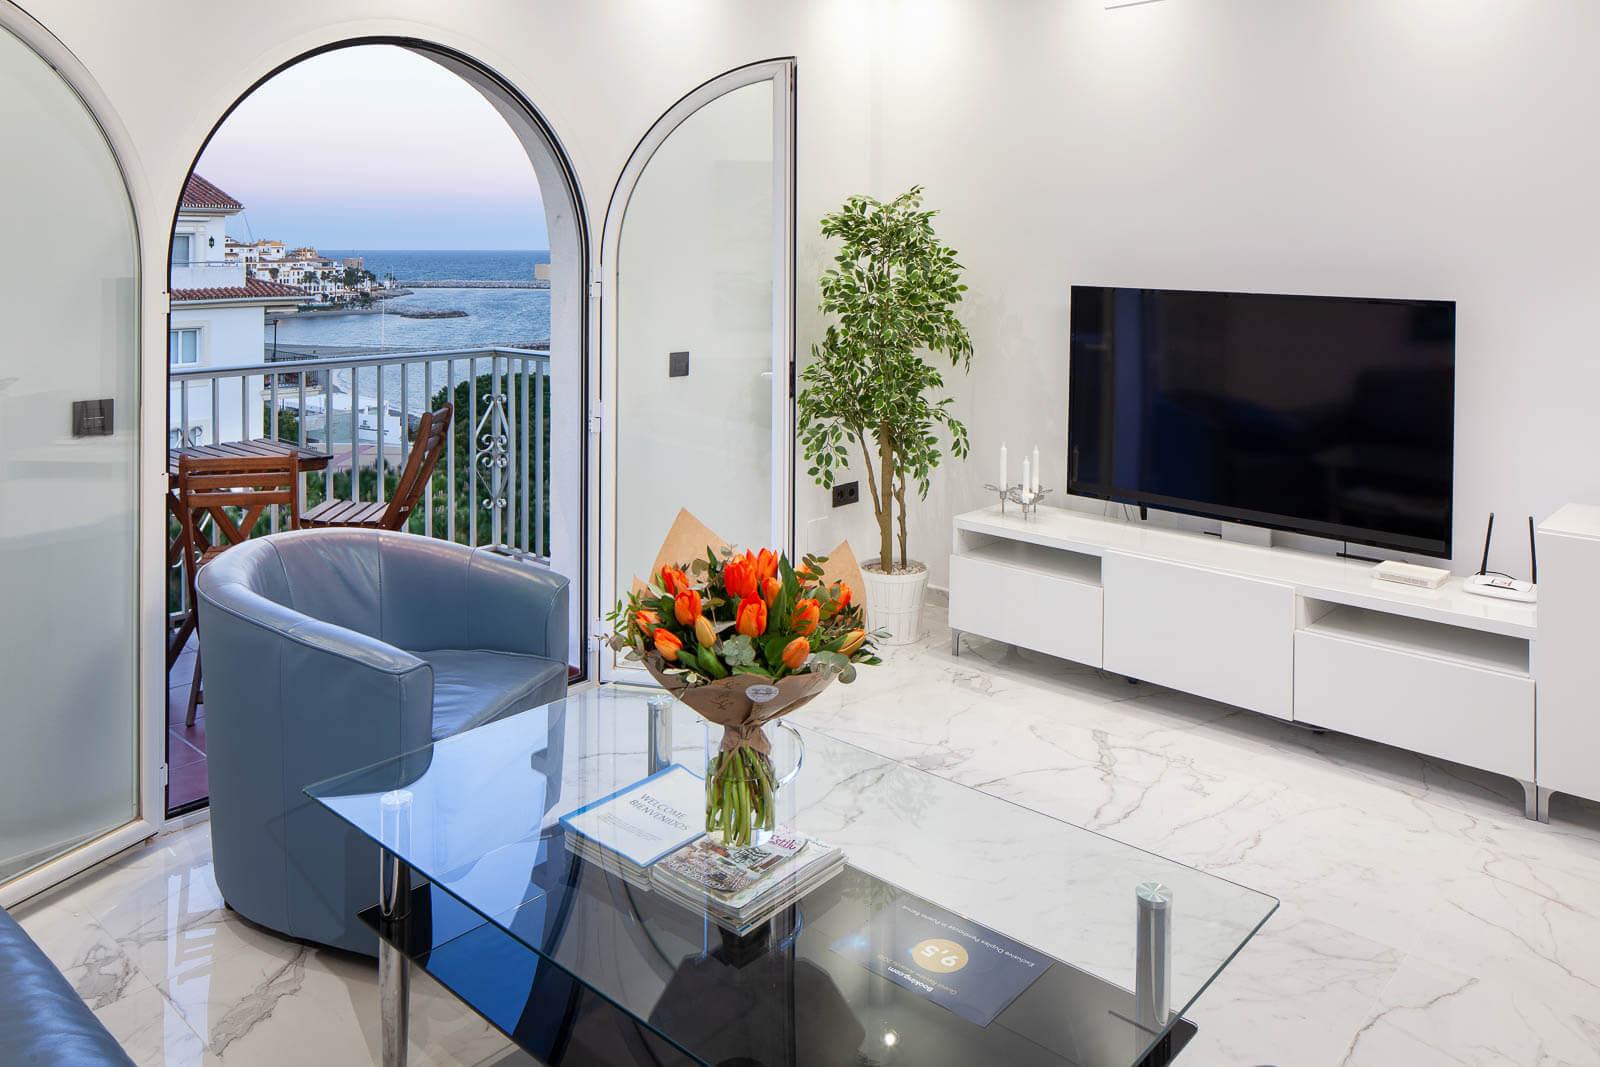 Apartament Puerto Banus - widok z okna